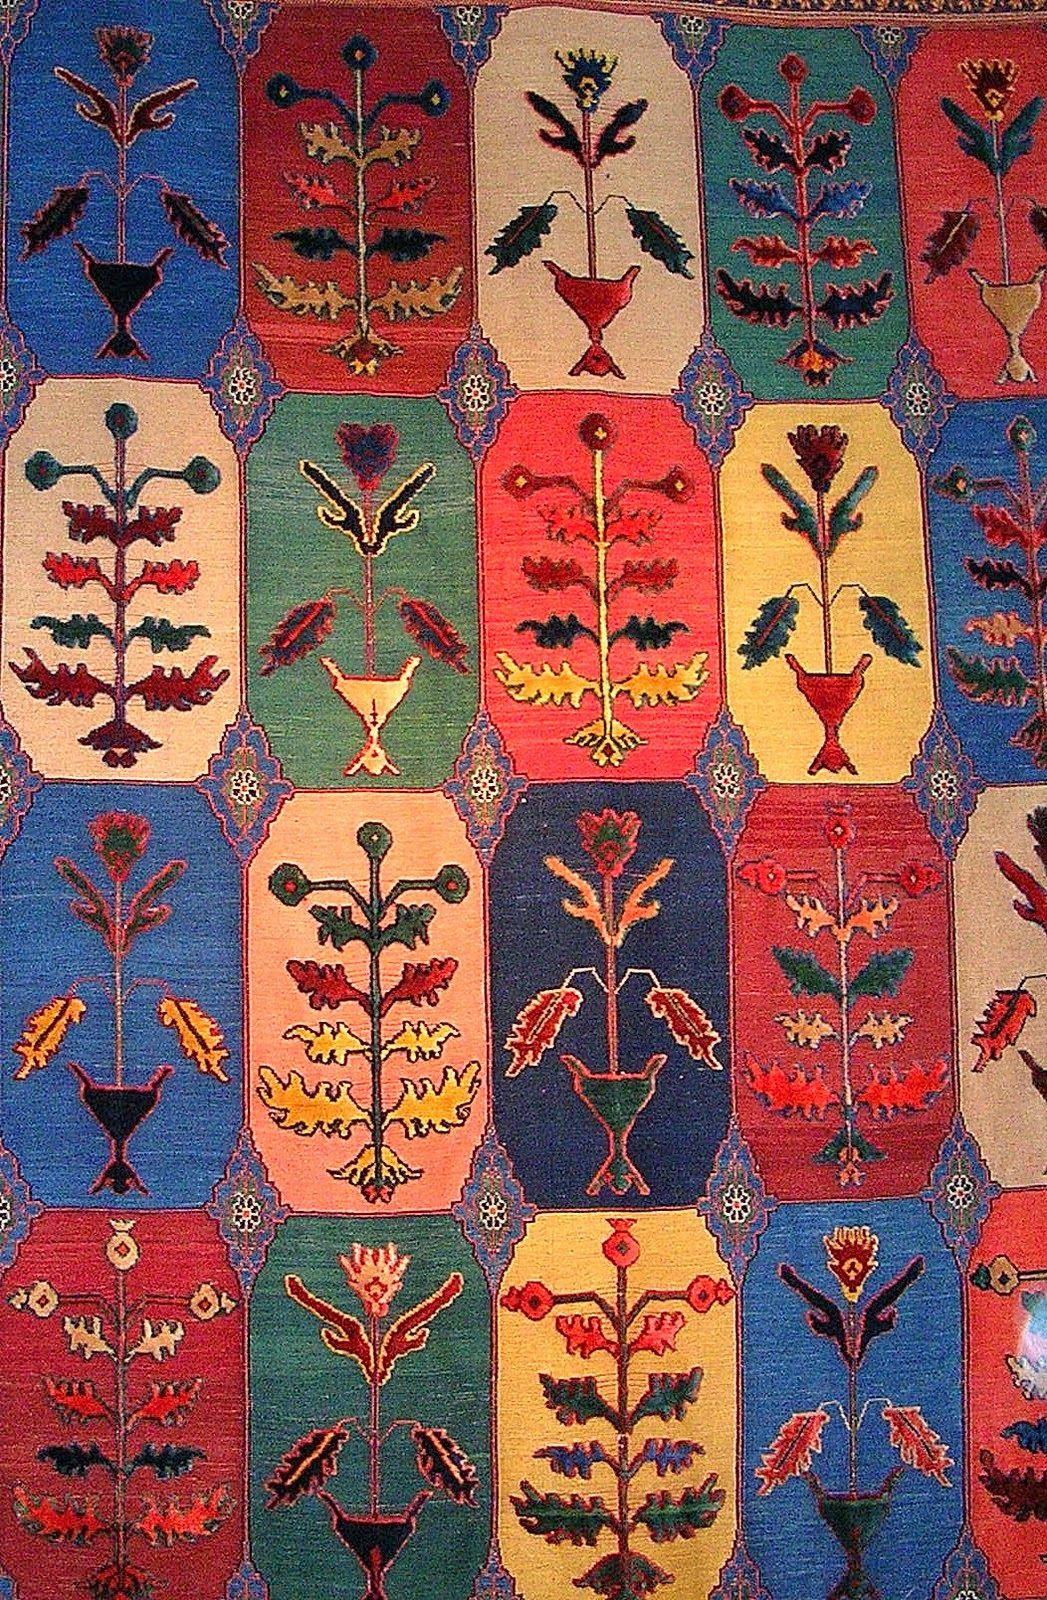 #handmade #handmaderugs #color #design #home #homedesign #flowers #spring #life #plantaseed #natural #organic #Persian #pattern #fresh #freshideas